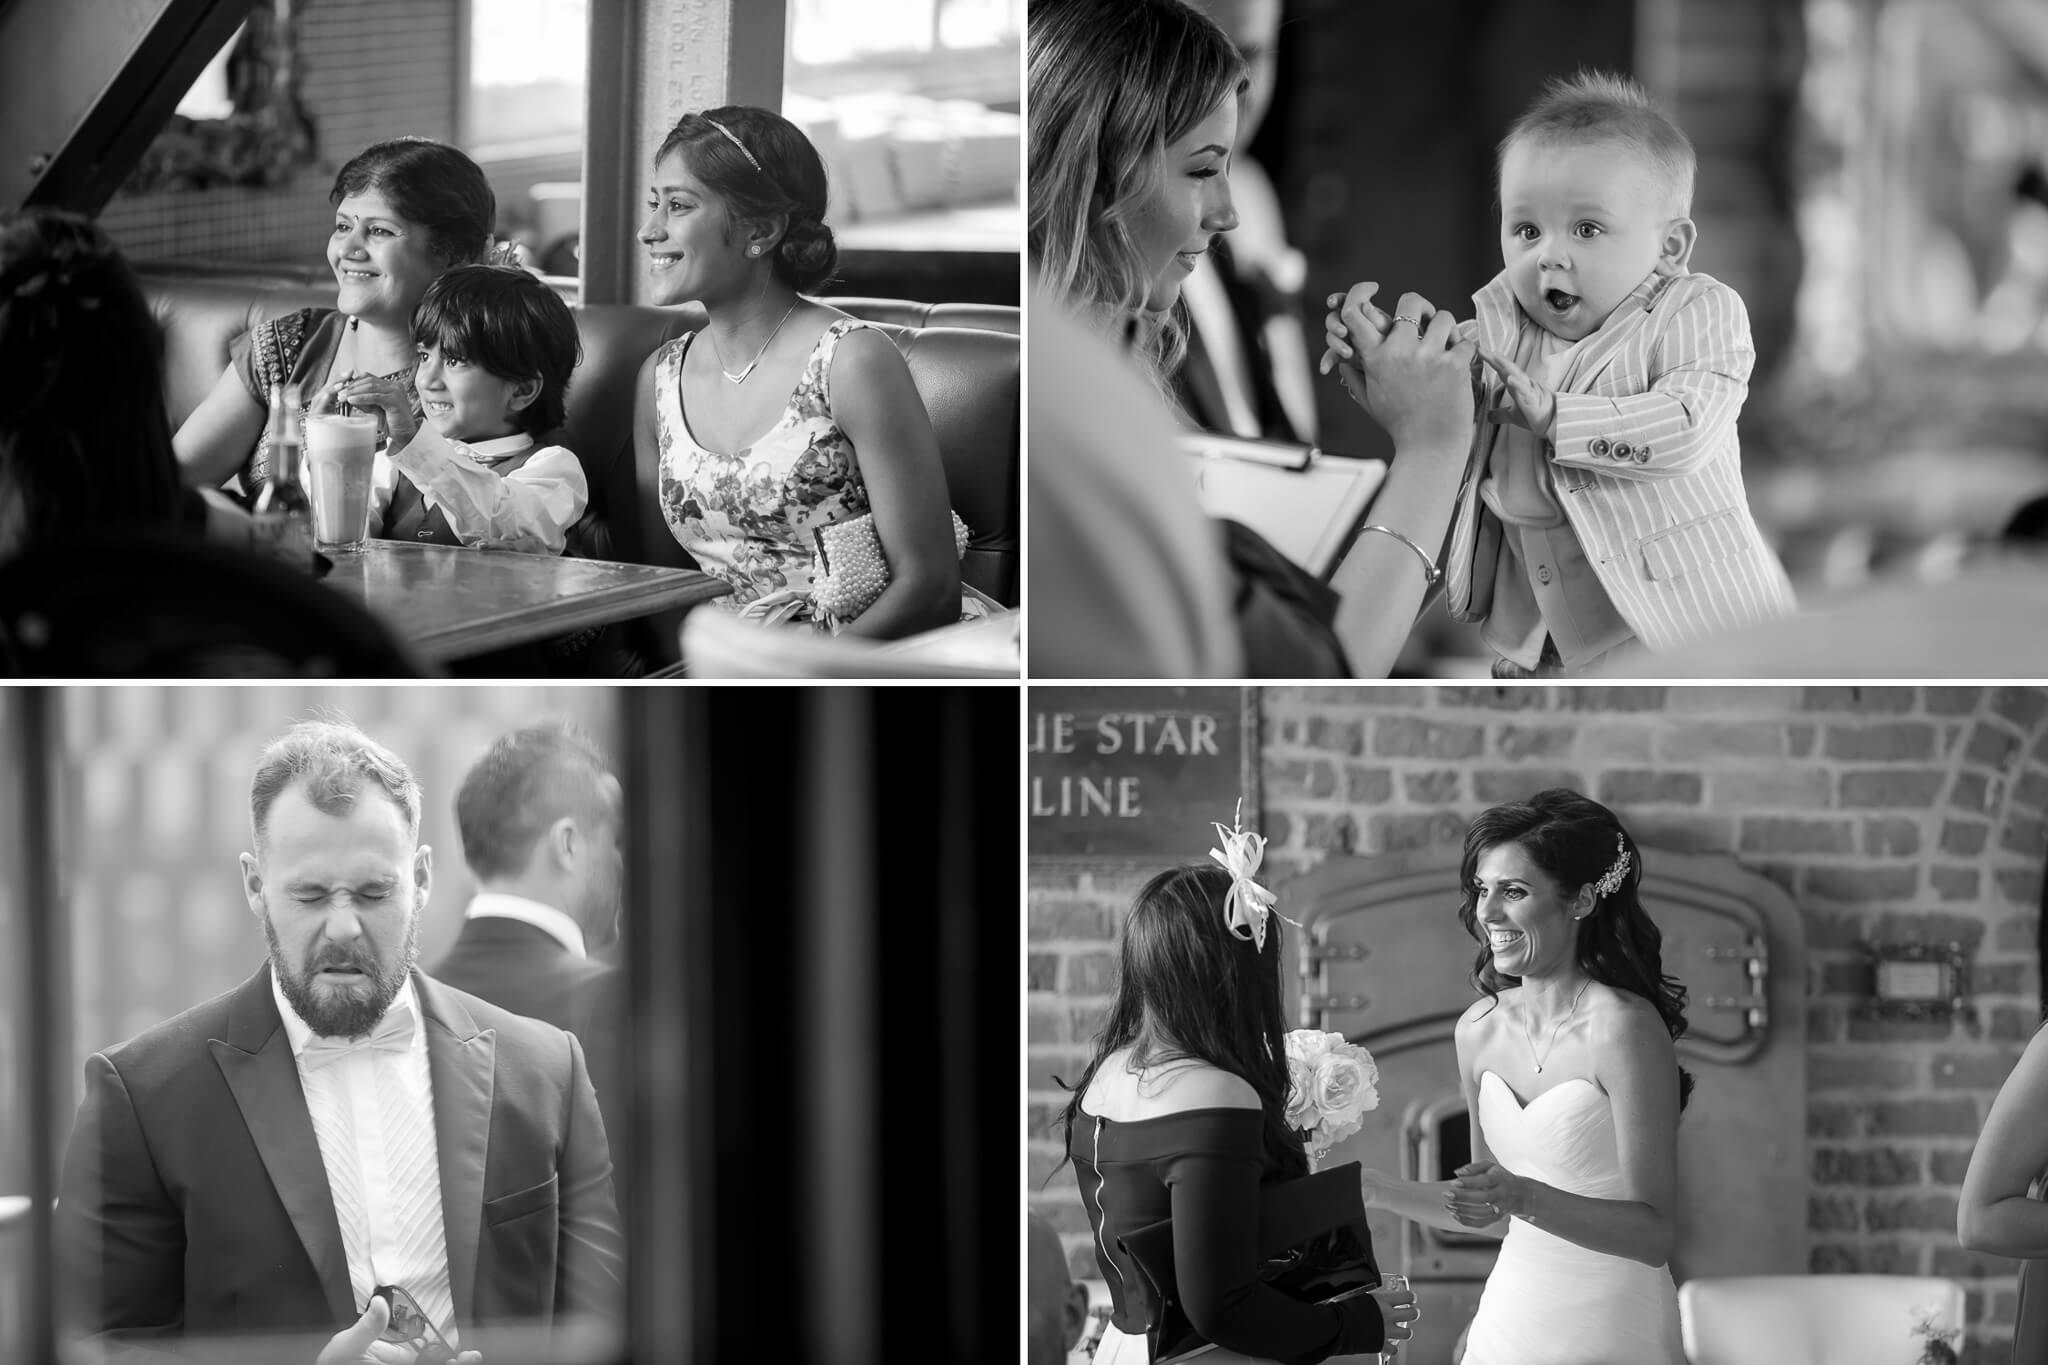 weddingguests-chatting-liverpool-wedding-photography